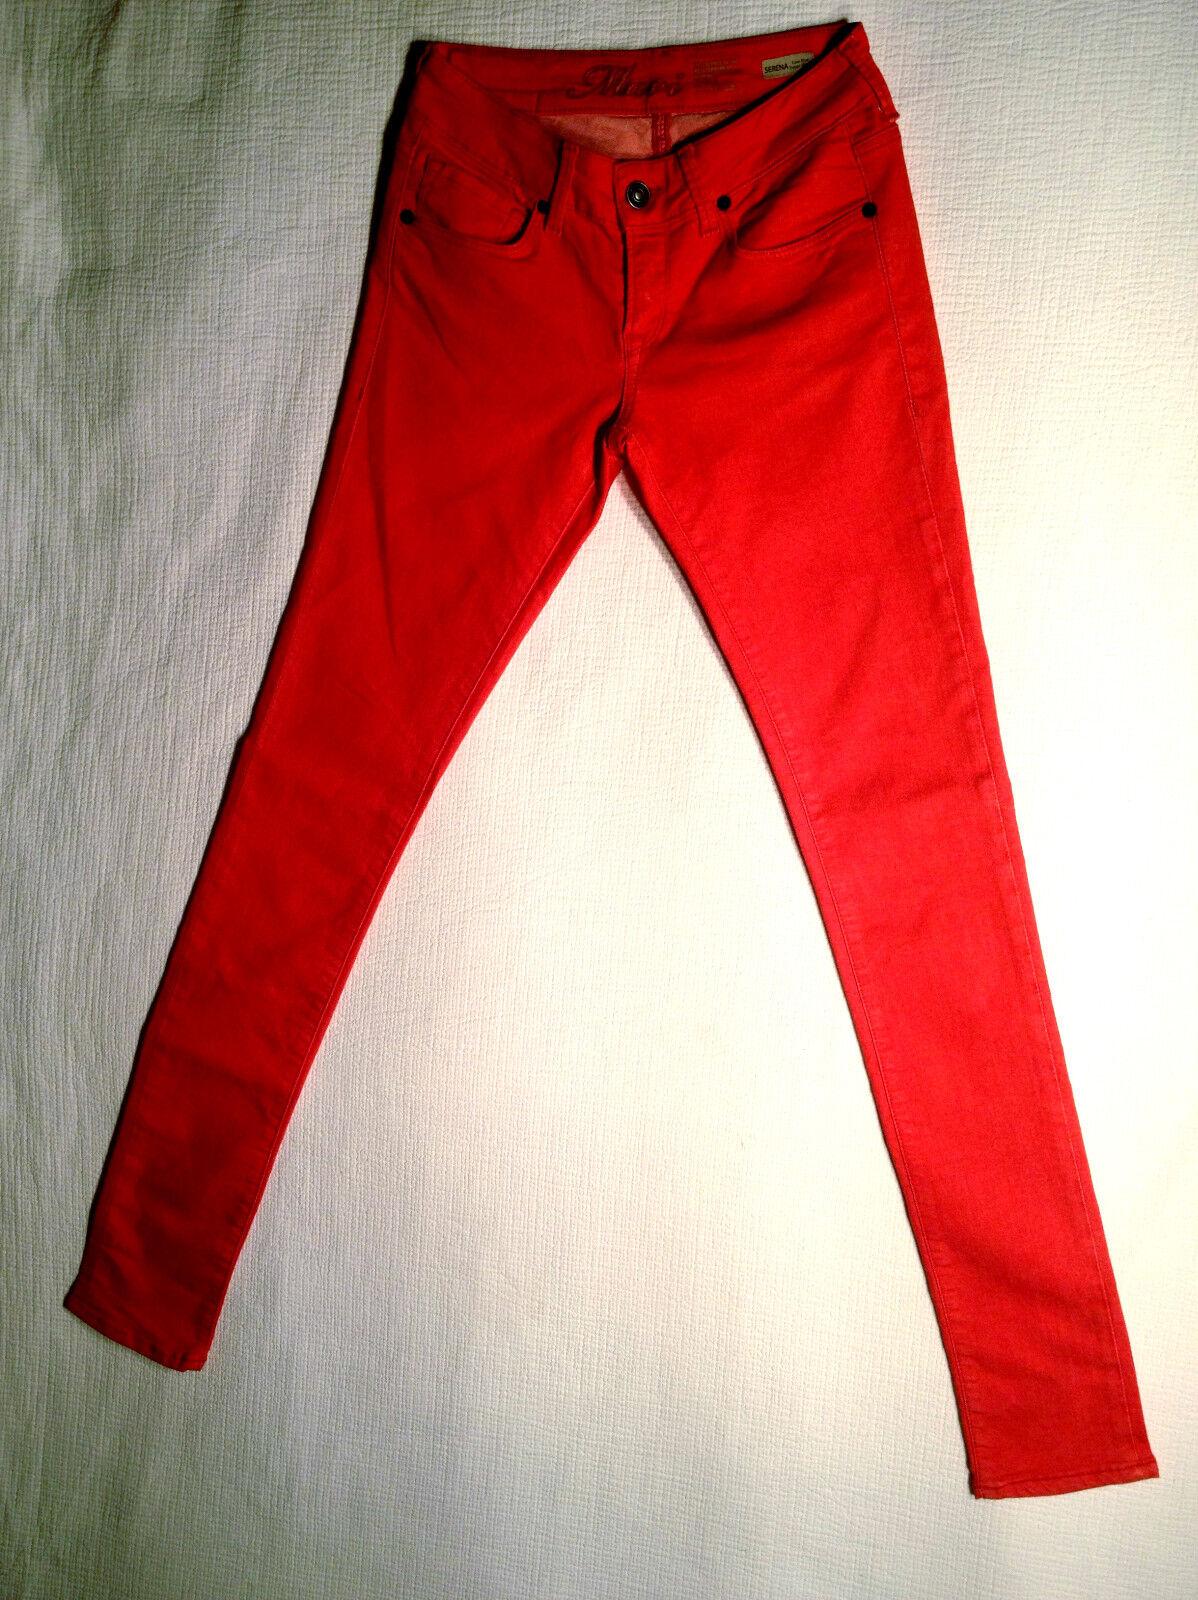 MAVI Jeans Stretch 'SERENA' Low Rise Skinny Red W26 L34 AU8 EUC LOOK NEW Womens